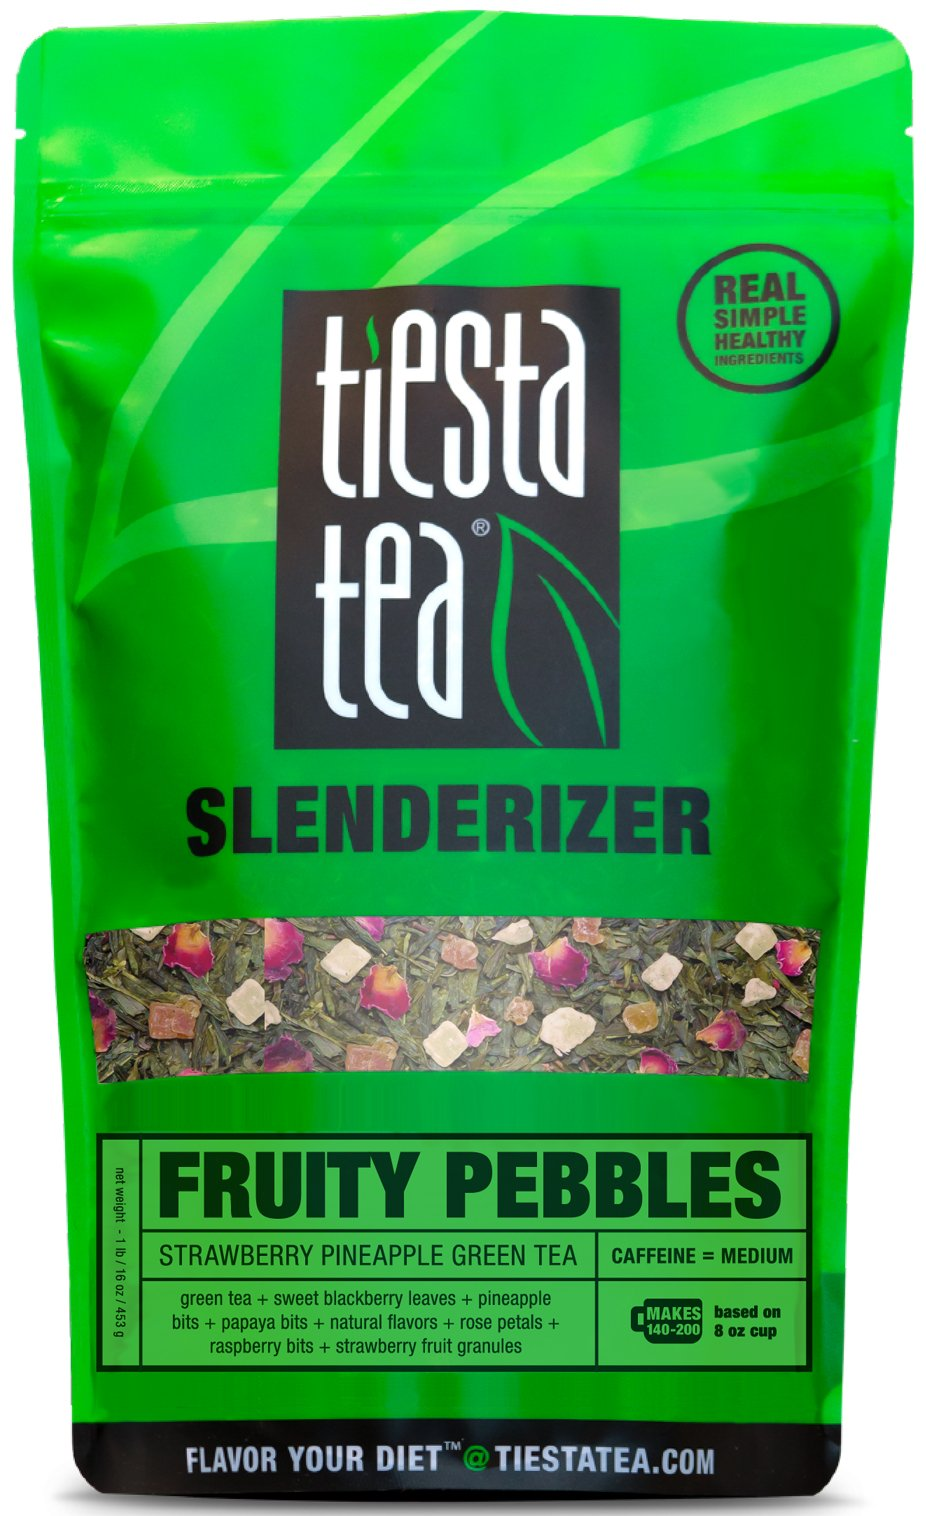 Tiesta Tea Fruity Pebbles, Strawberry Pineapple Green Tea, 200 Servings, 1 Pound Bag, Medium Caffeine, Loose Leaf Green Tea Slenderizer Blend